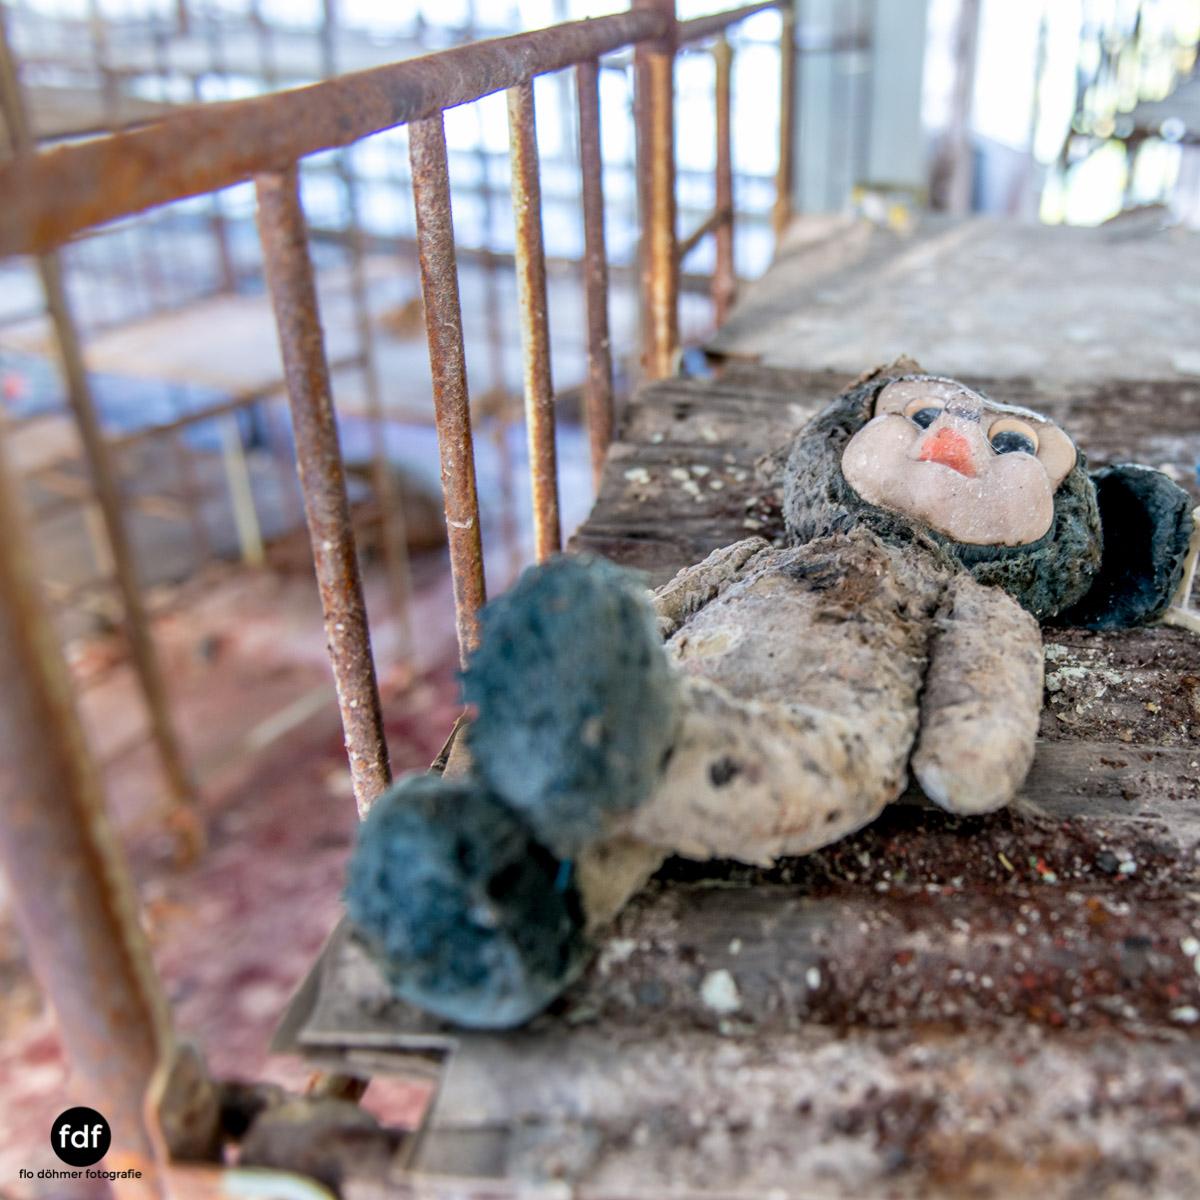 Tschernobyl-Chernobyl-Prypjat-Urbex-Lost-Place-Klavierhaus-Kindergarten-14.jpg